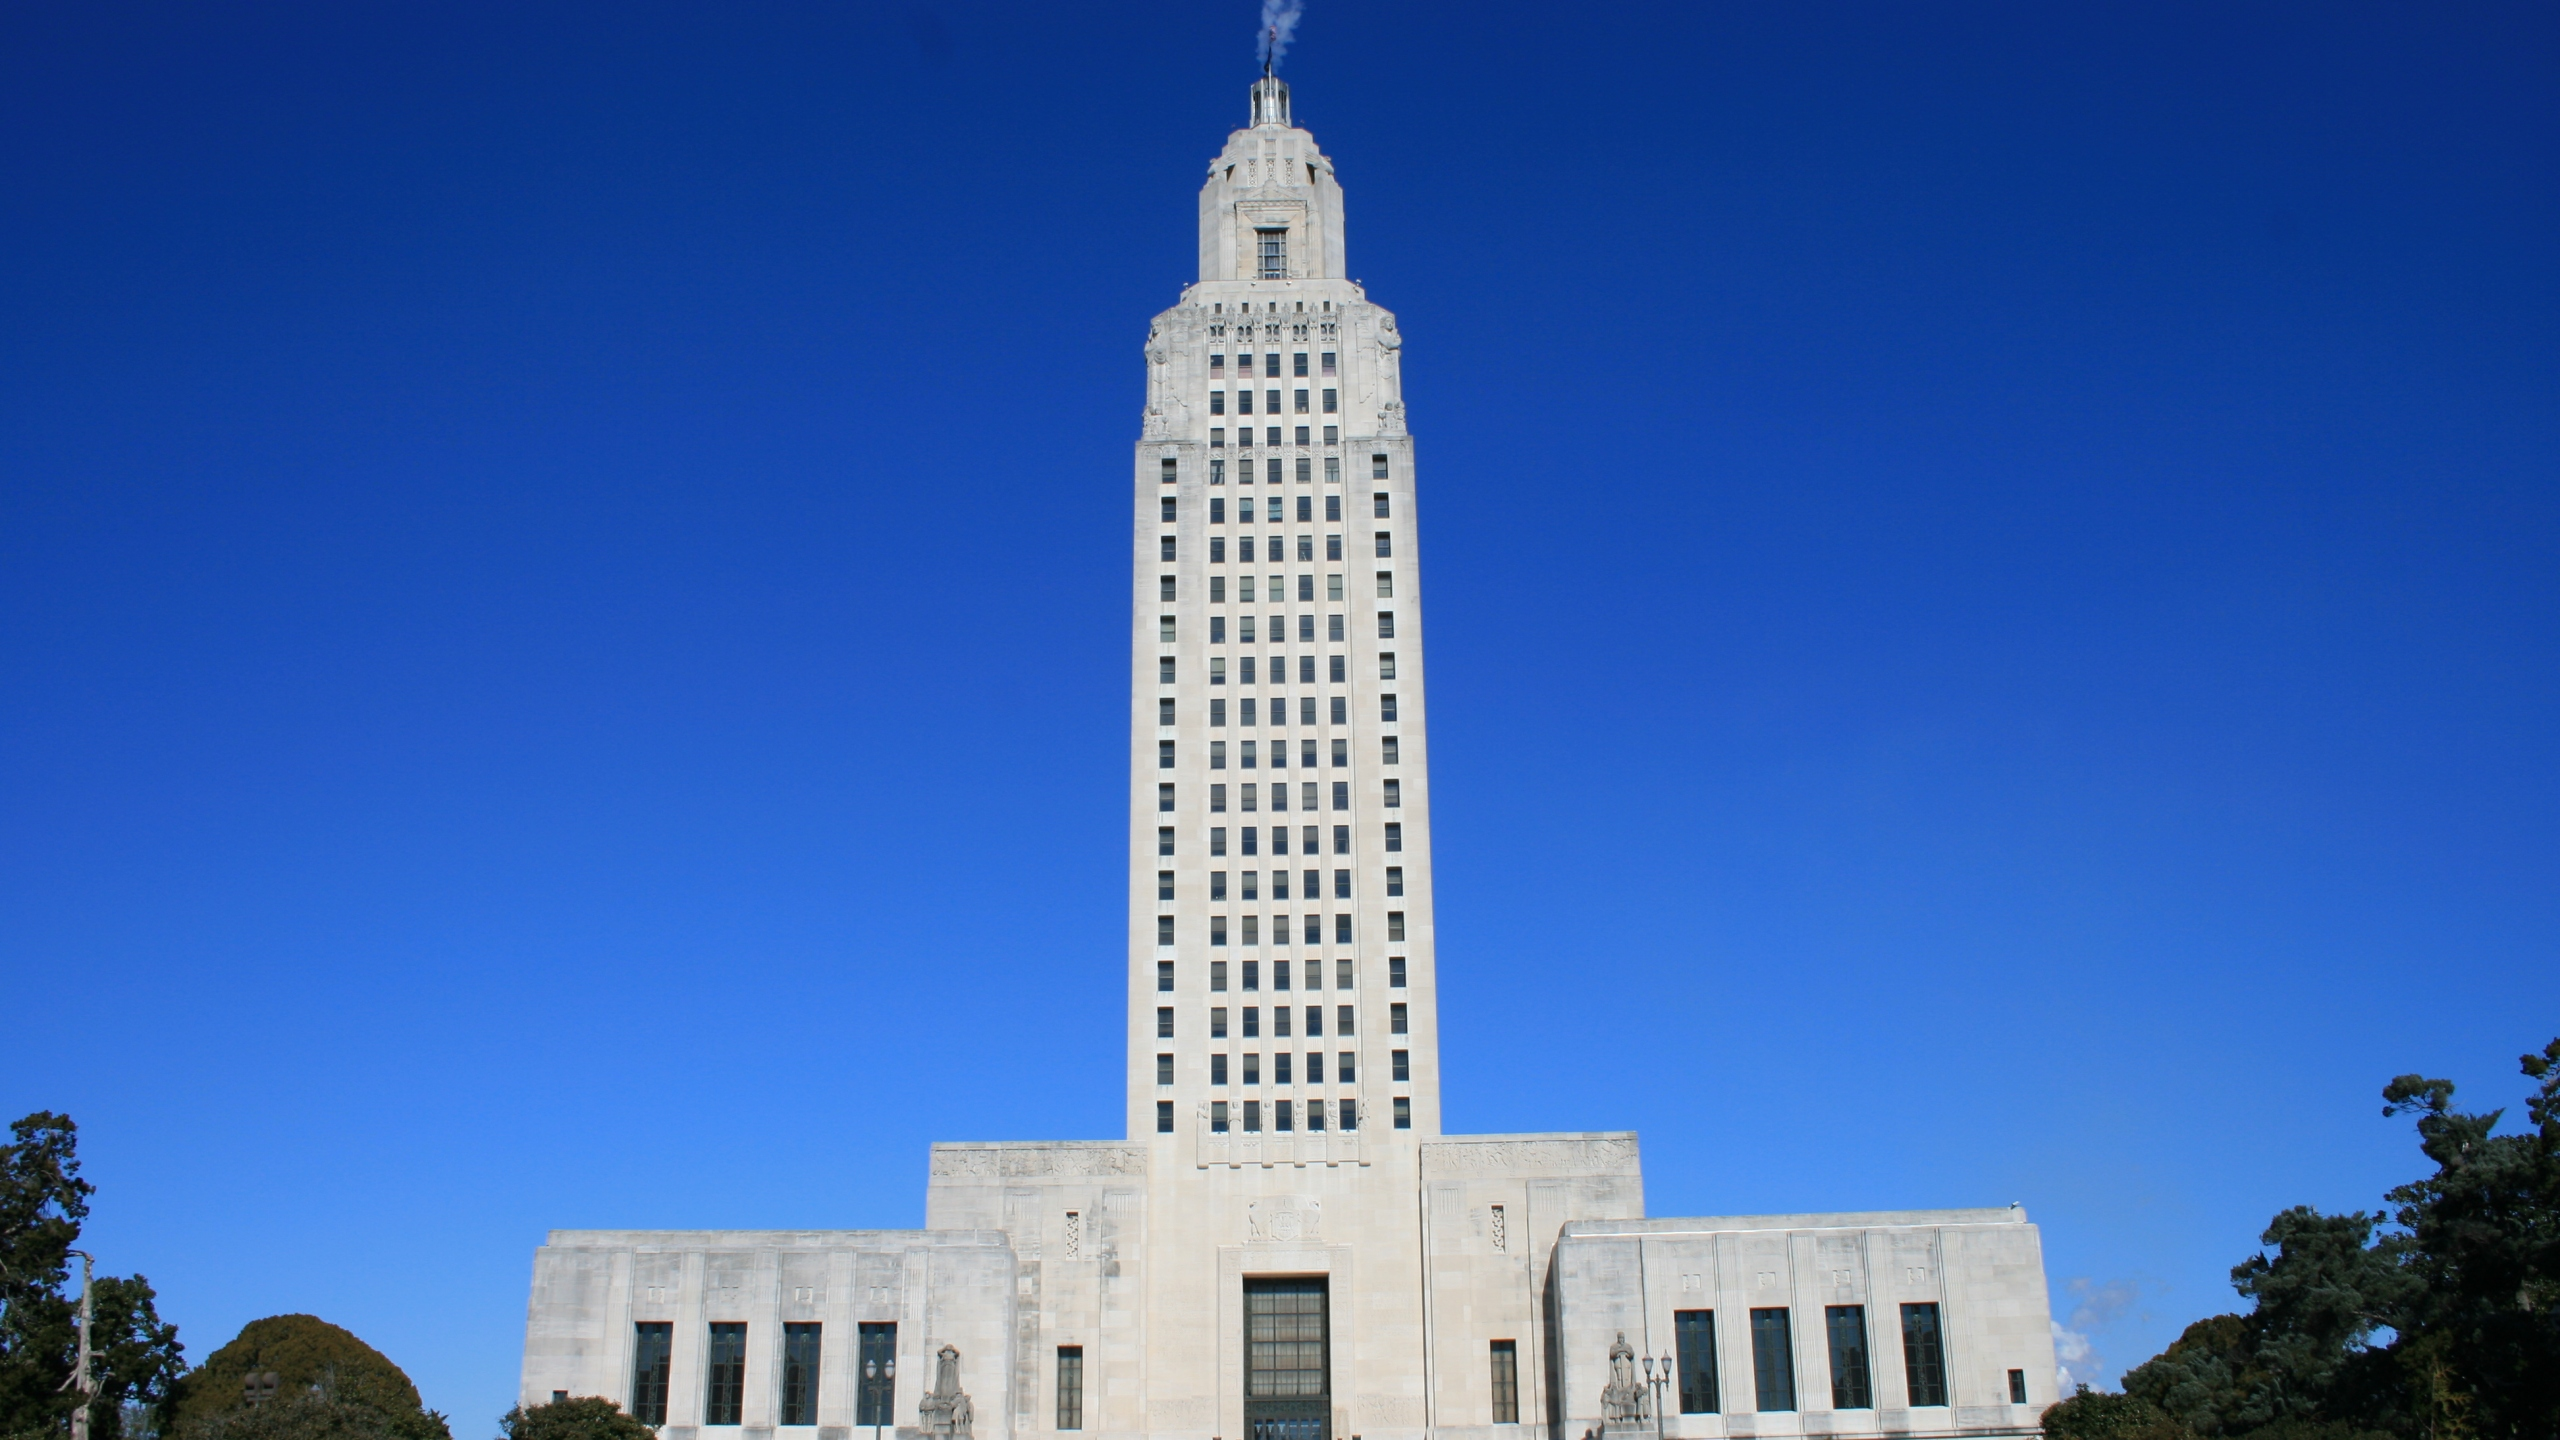 Louisiana_State_Capitol_2 (1)_1470112586163.jpg